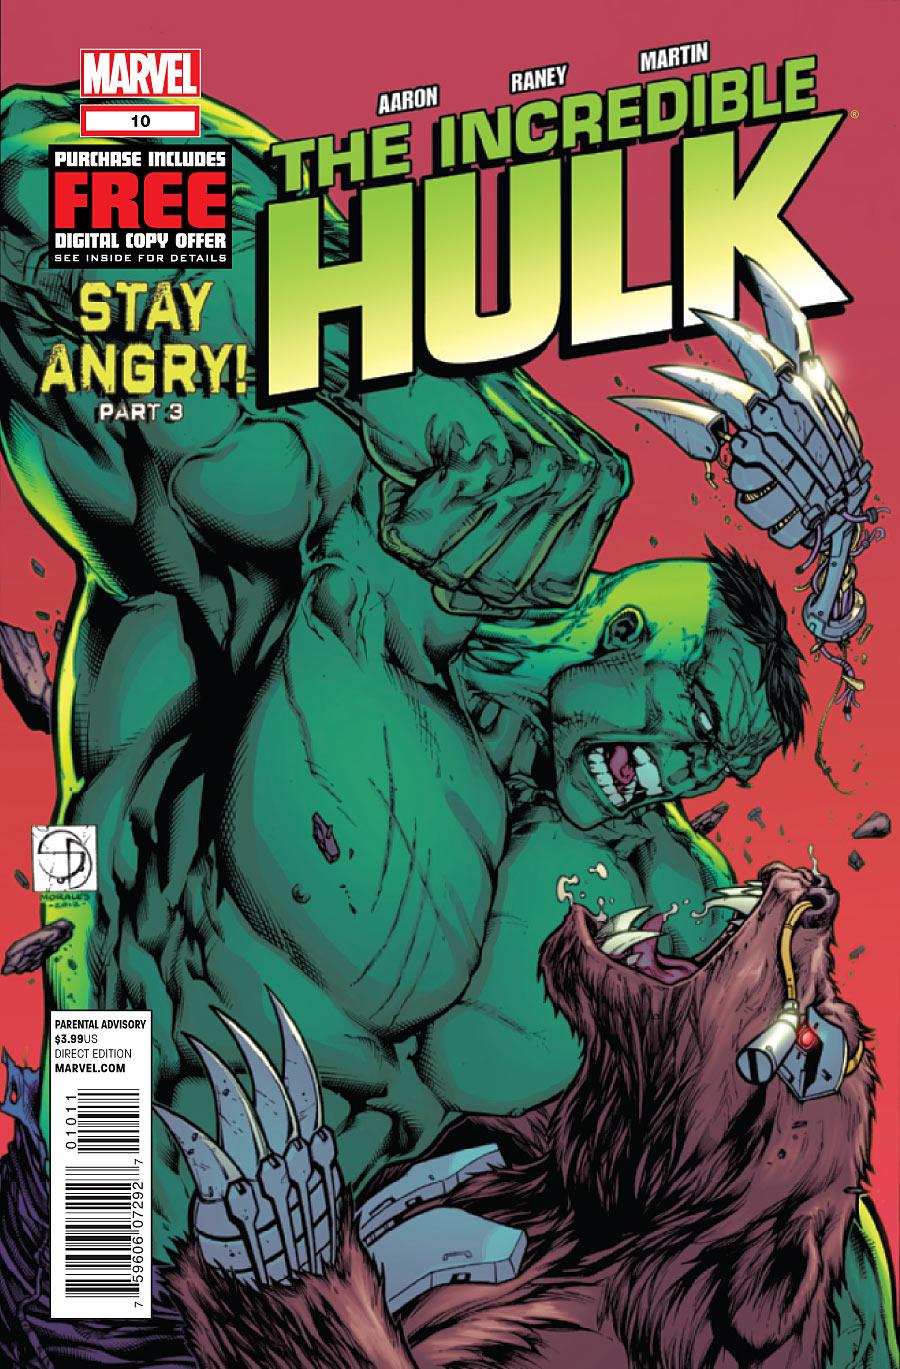 Incredible_Hulk_Vol_3_10.jpg